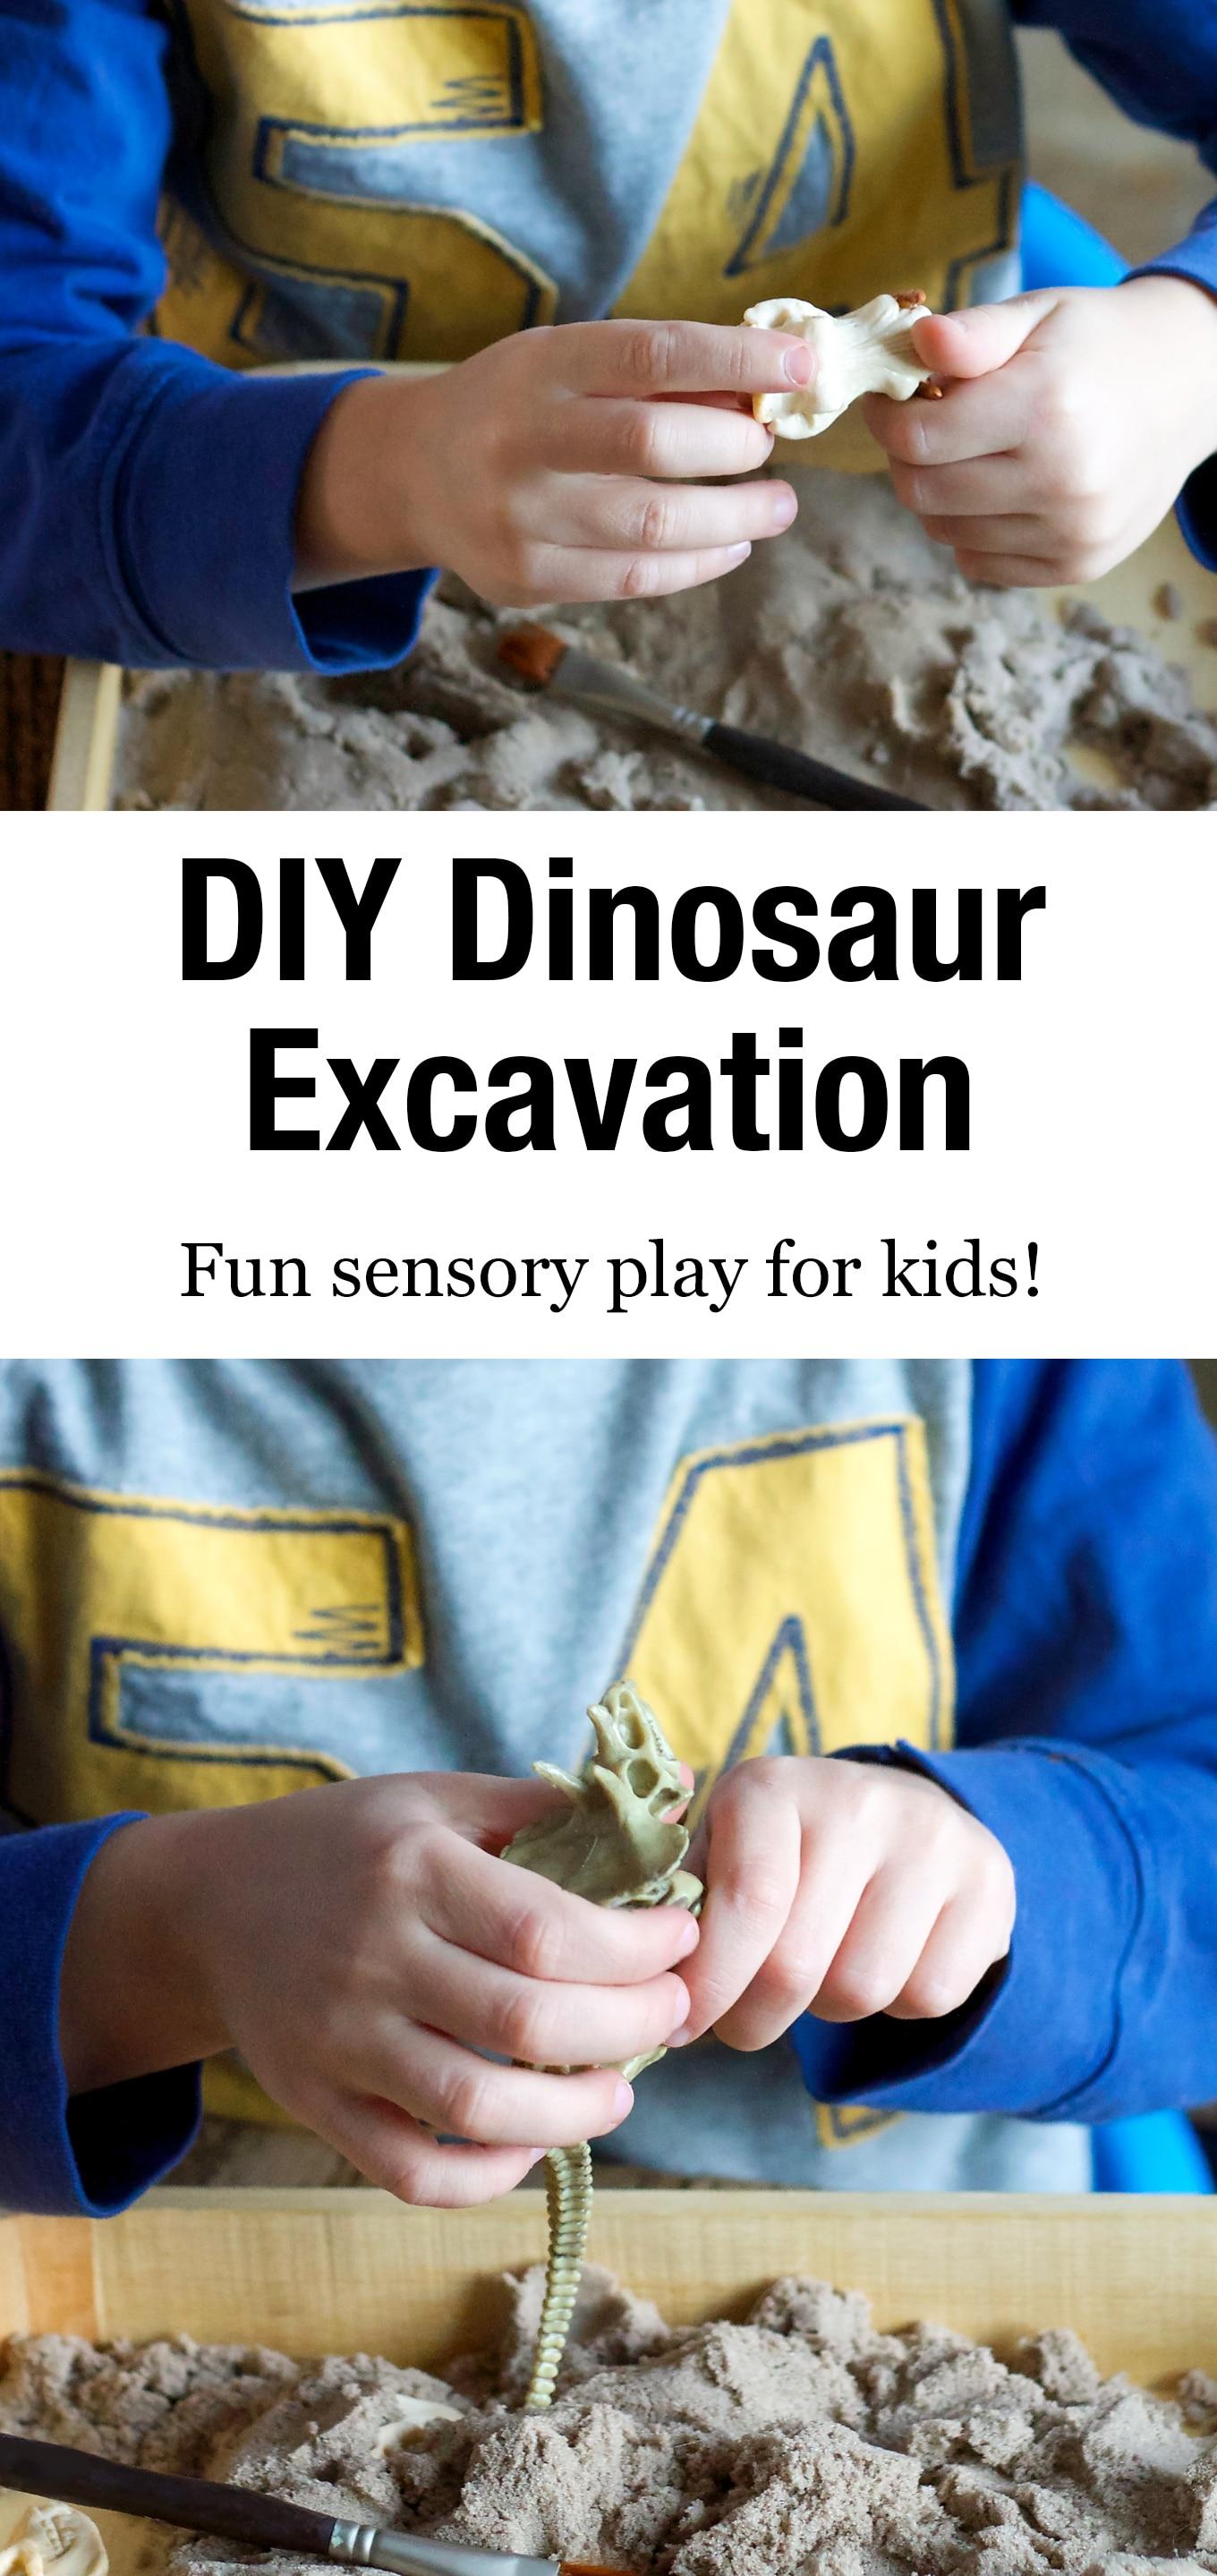 Learn how to make a DIYDinosaur Dig sensory bin for your pint-sized paleontologist! It's an easy and fun way for kids to learn about dinosaurs. #dinosaurdig #sensorybin #preschool #kidsactivities via @firefliesandmudpies